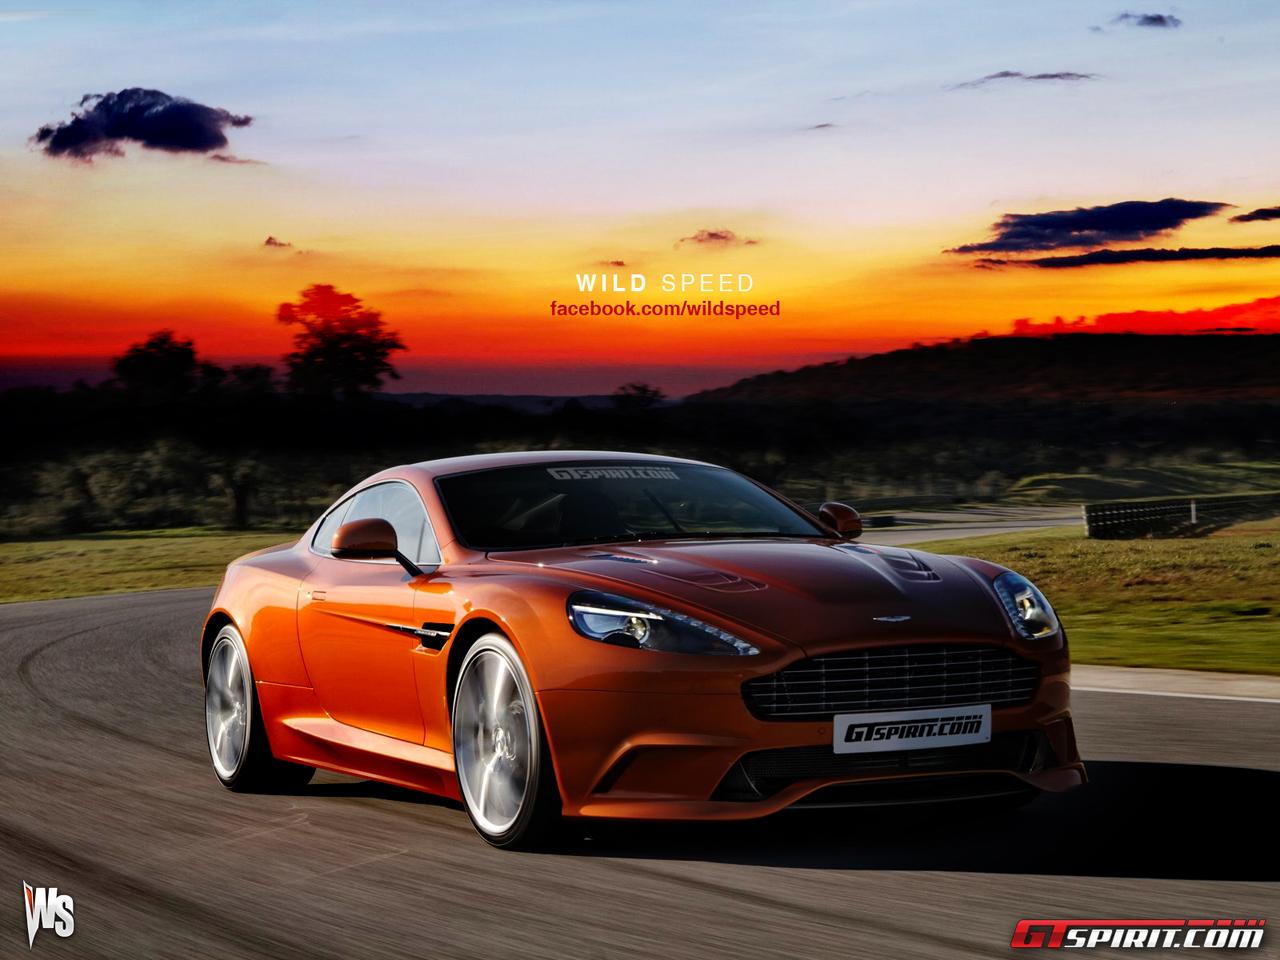 Thread: 2013 Aston Martin DBS Renderings